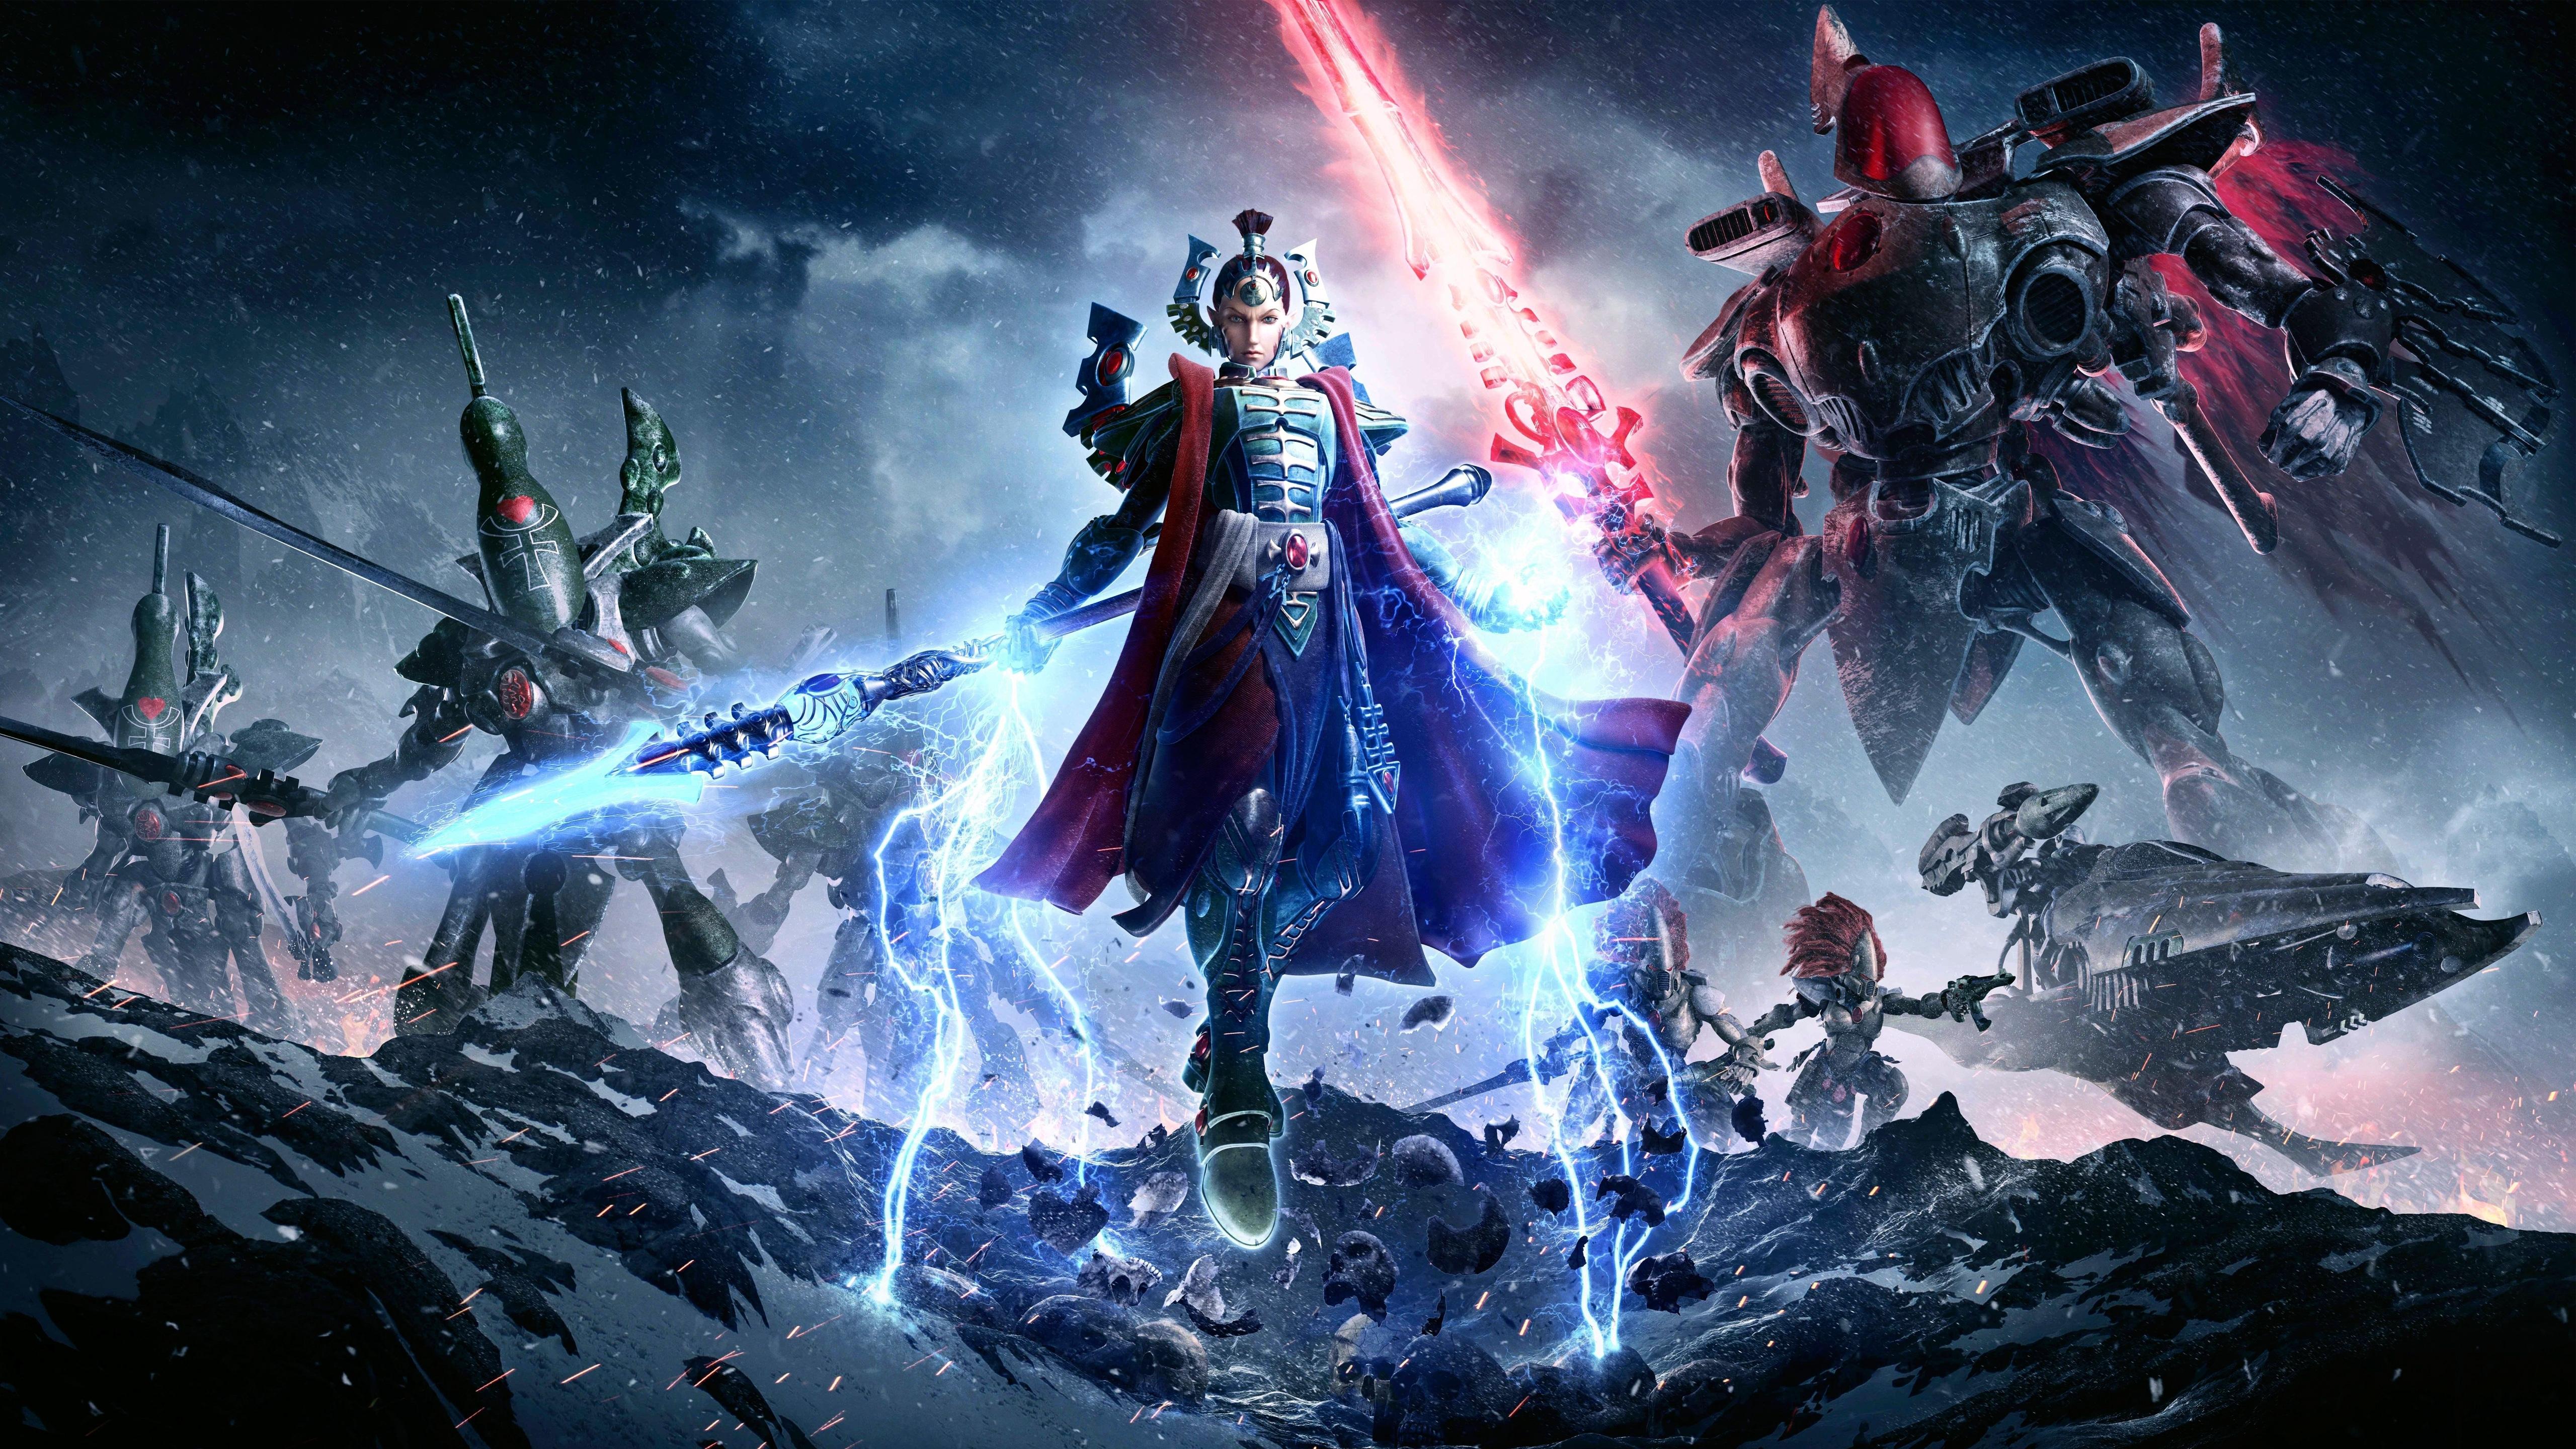 2017 warhammer 40k dawn of war 3 5k wallpapers   hd wallpapers   id